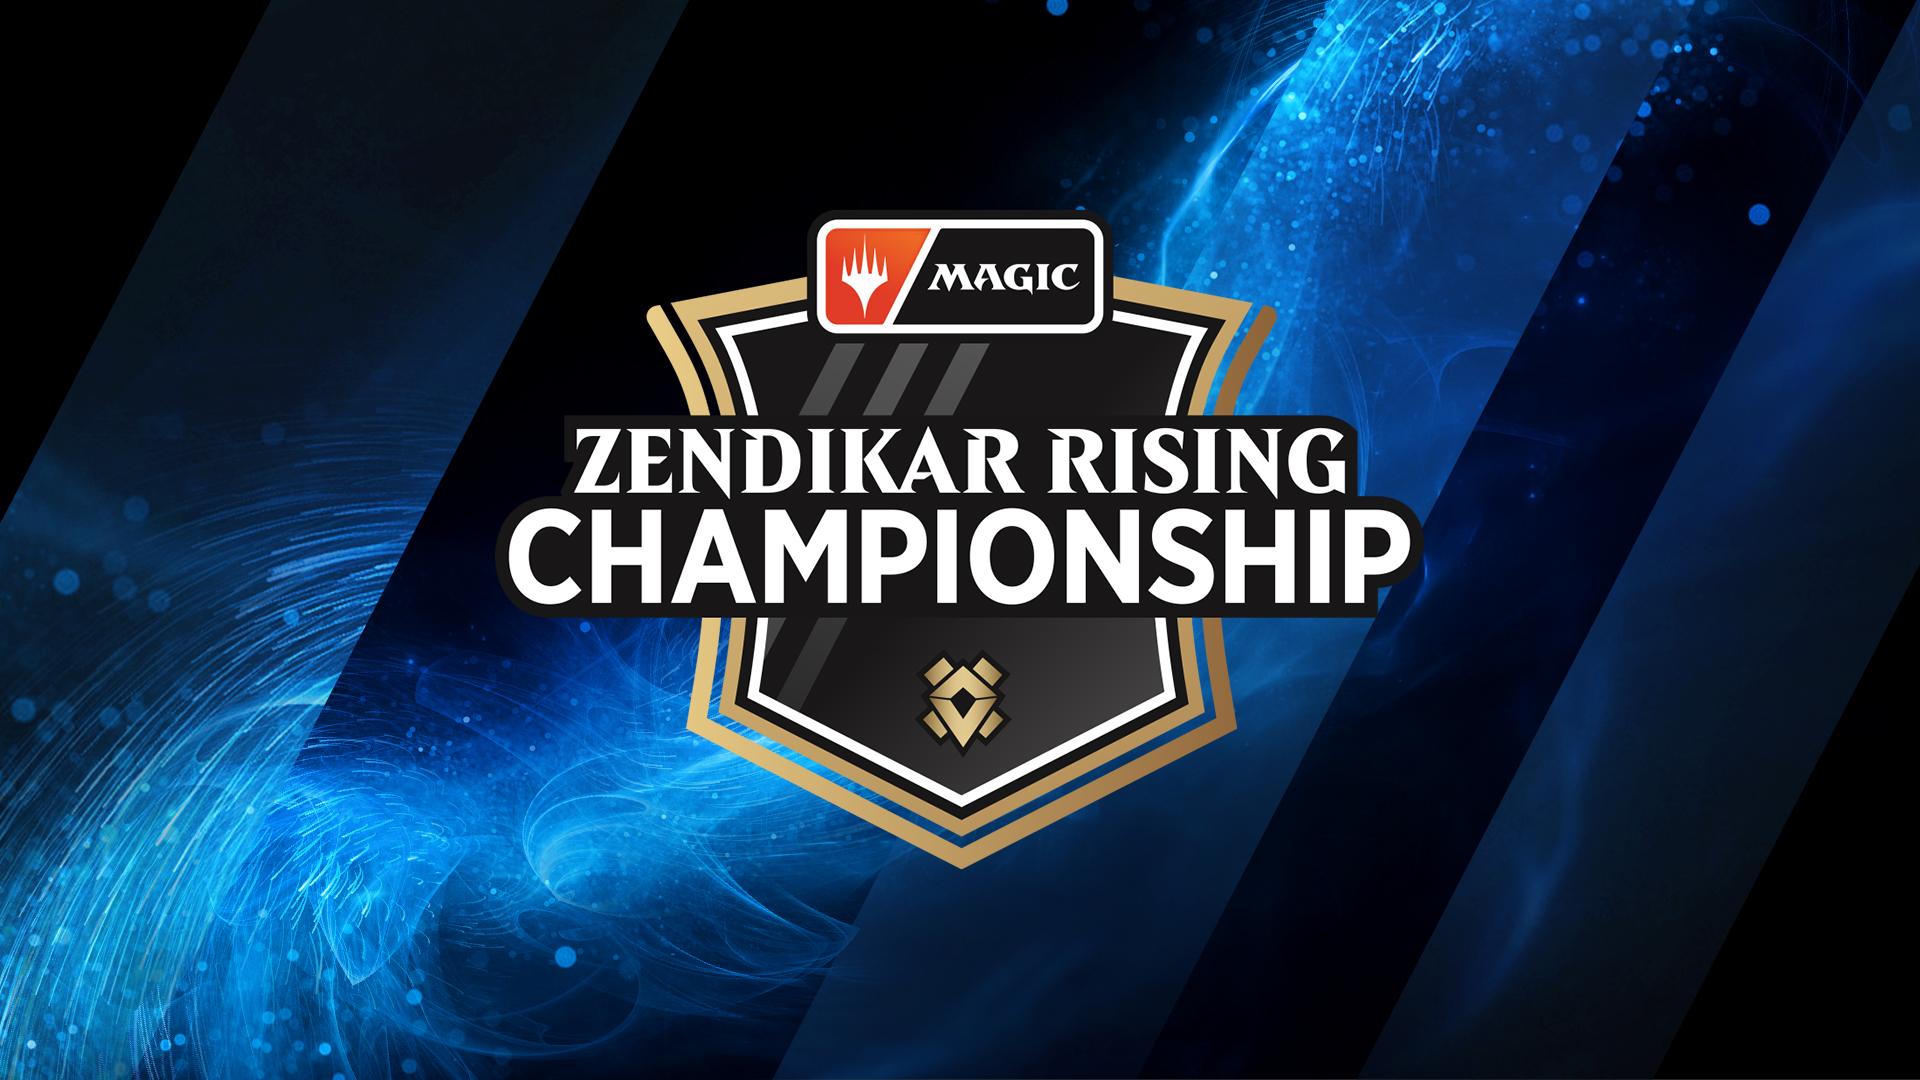 Zendikar Rising Championship